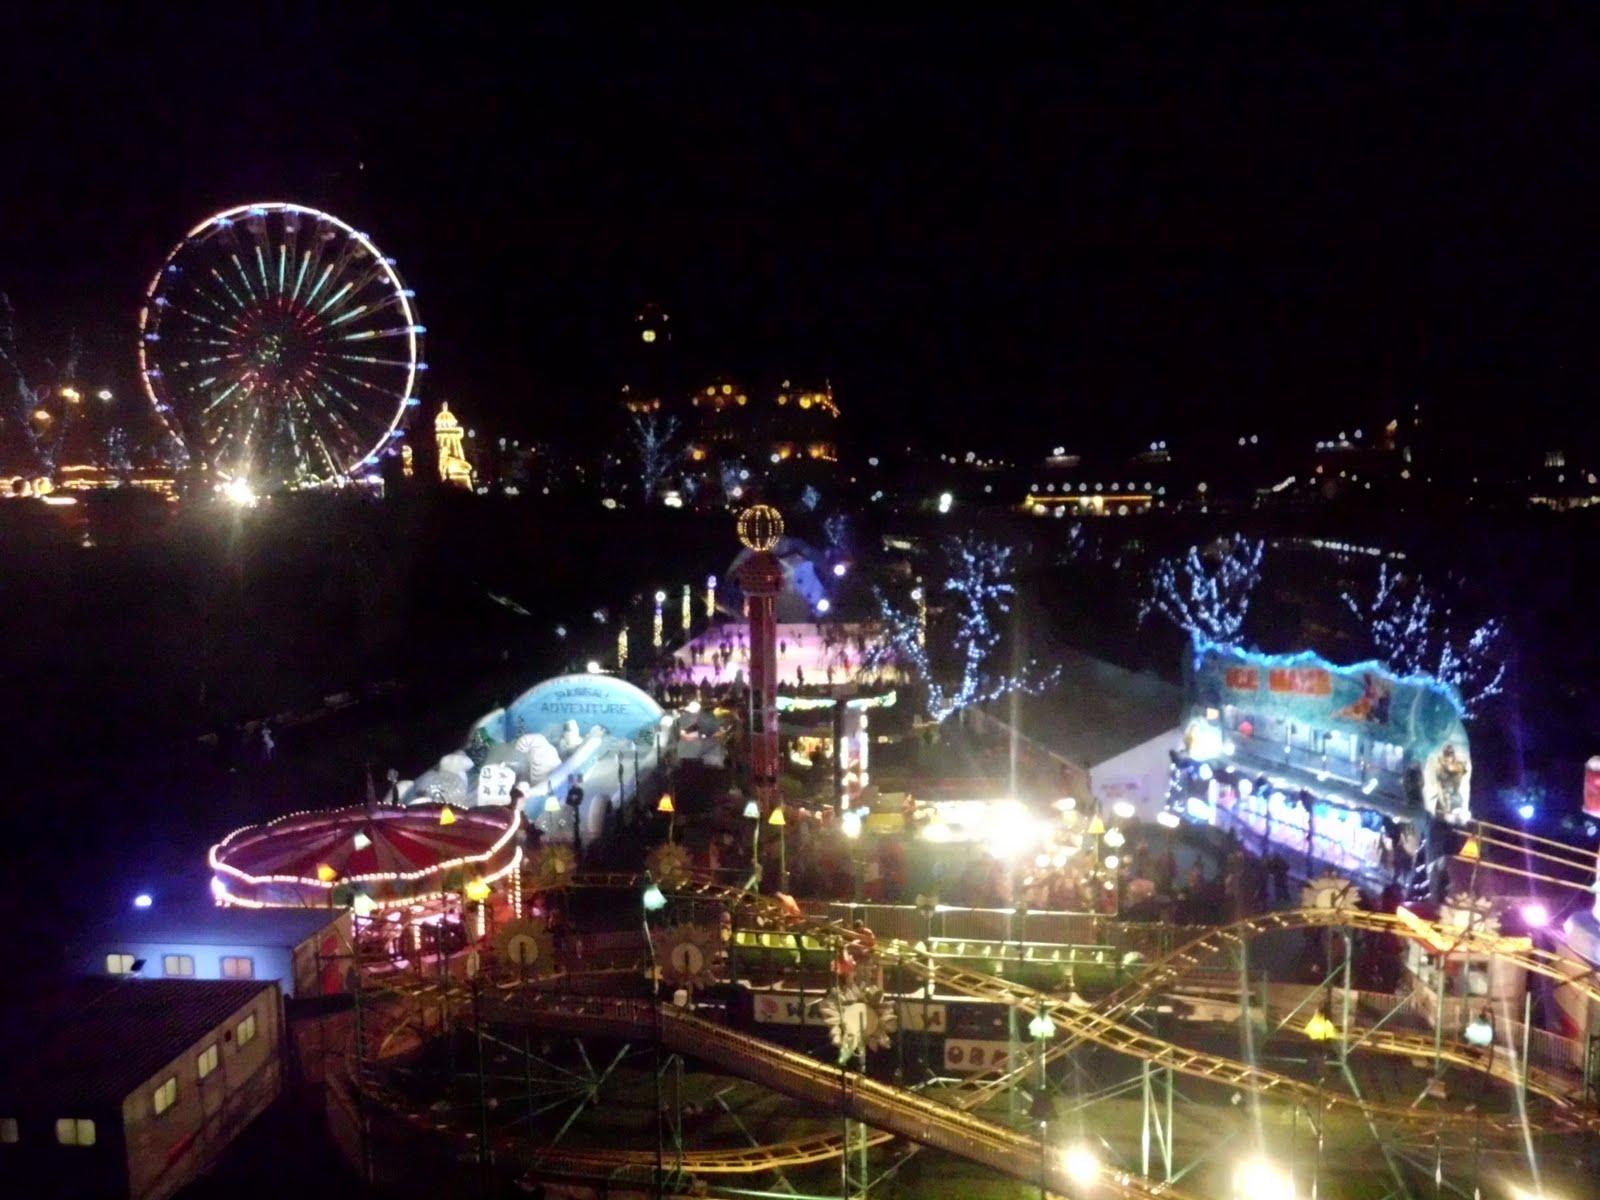 Feria de navidad de Edimburgo